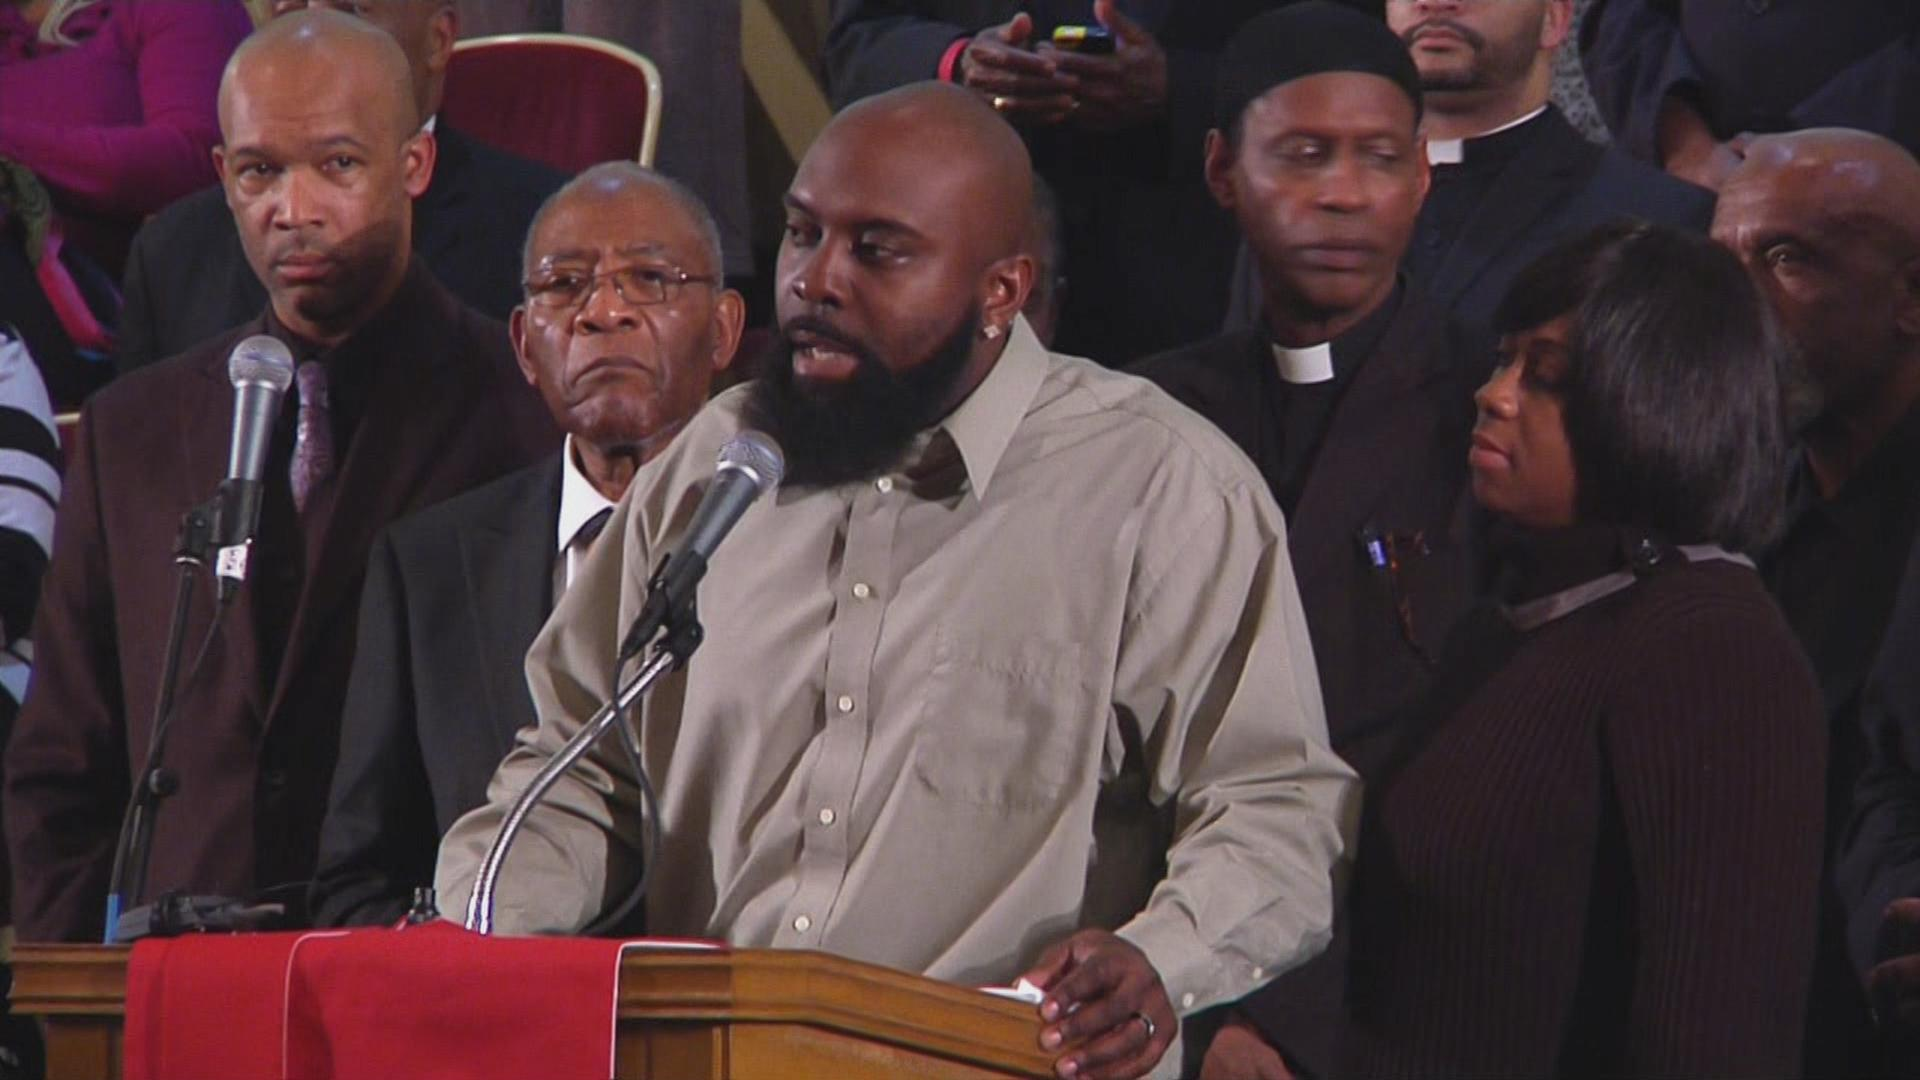 Michael Brown Sr. speaking at the Third Baptist Church in San Francisco. - Dec. 14, 2014.